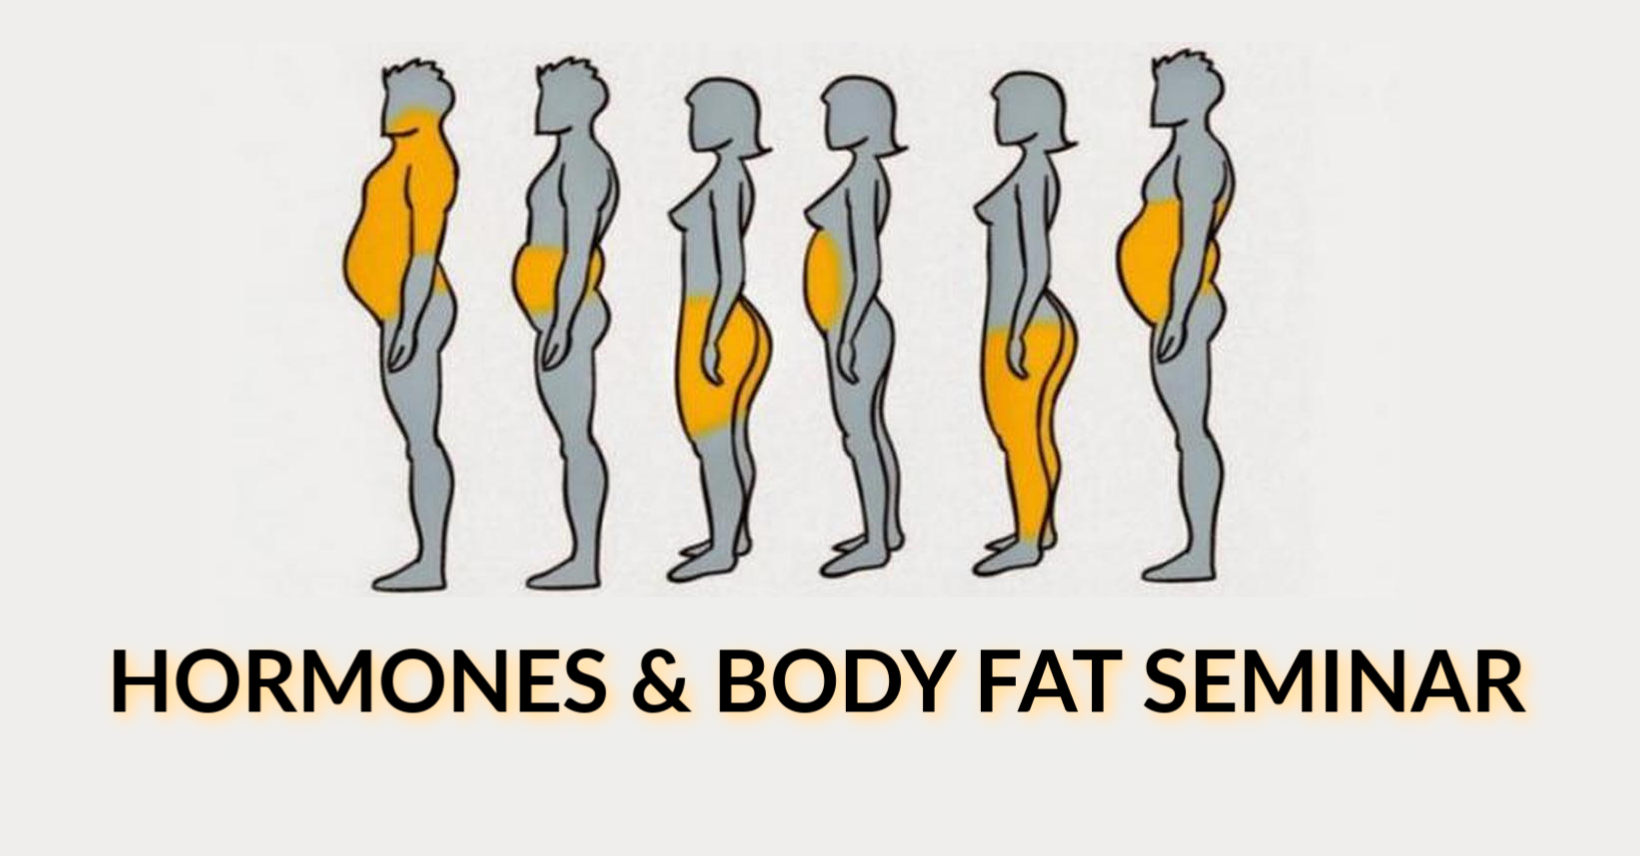 Hormonal Imbalance & Body Fat: Free Seminar